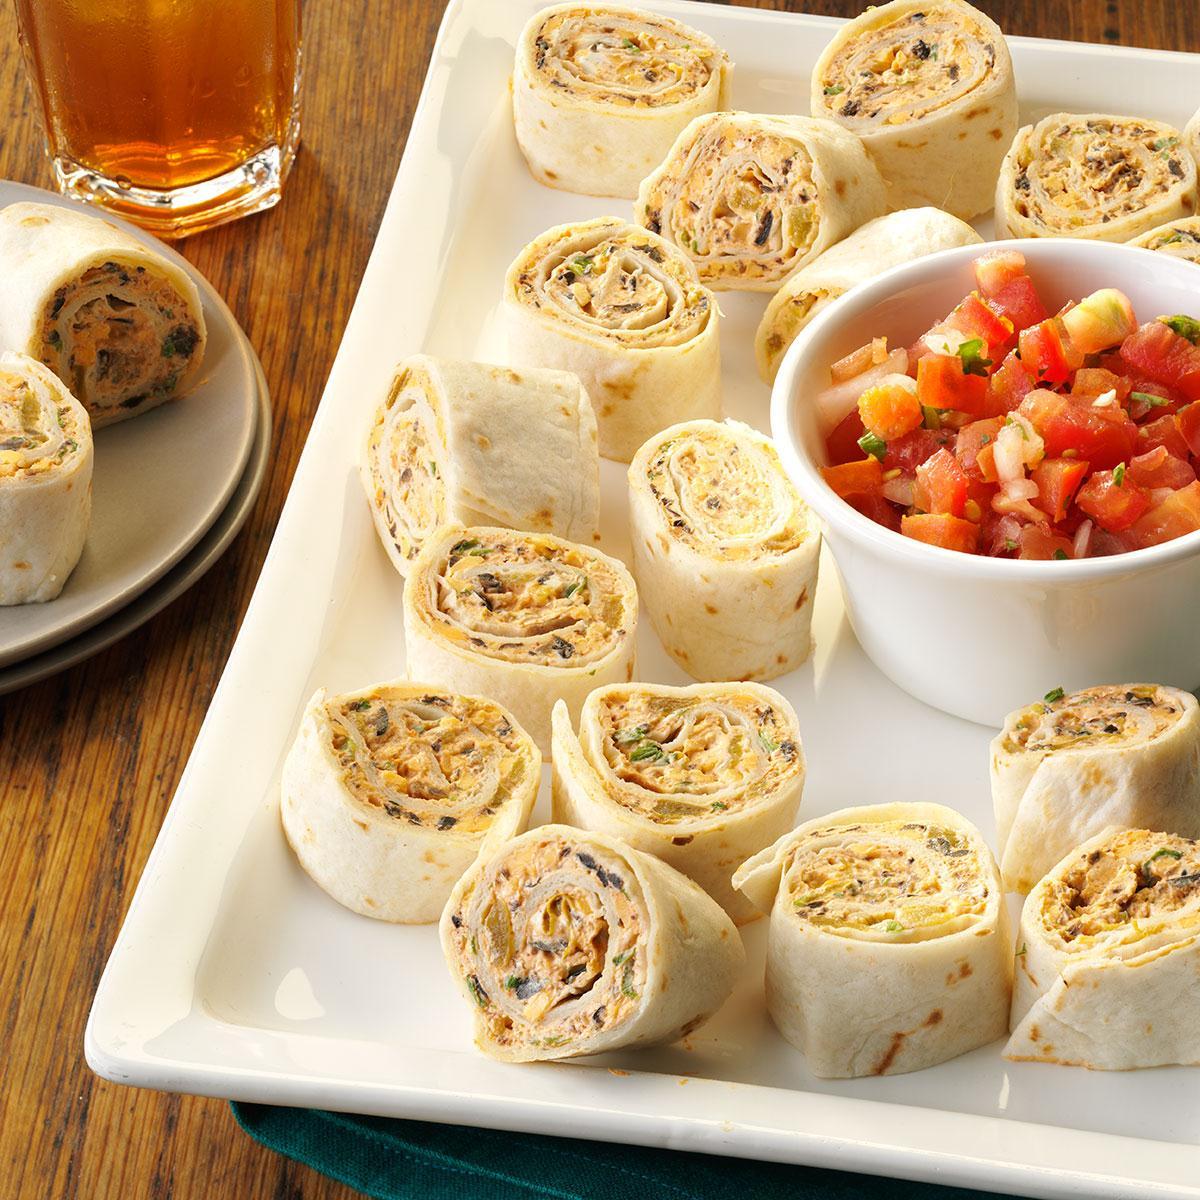 Fullsize Of Graduation Party Food Ideas